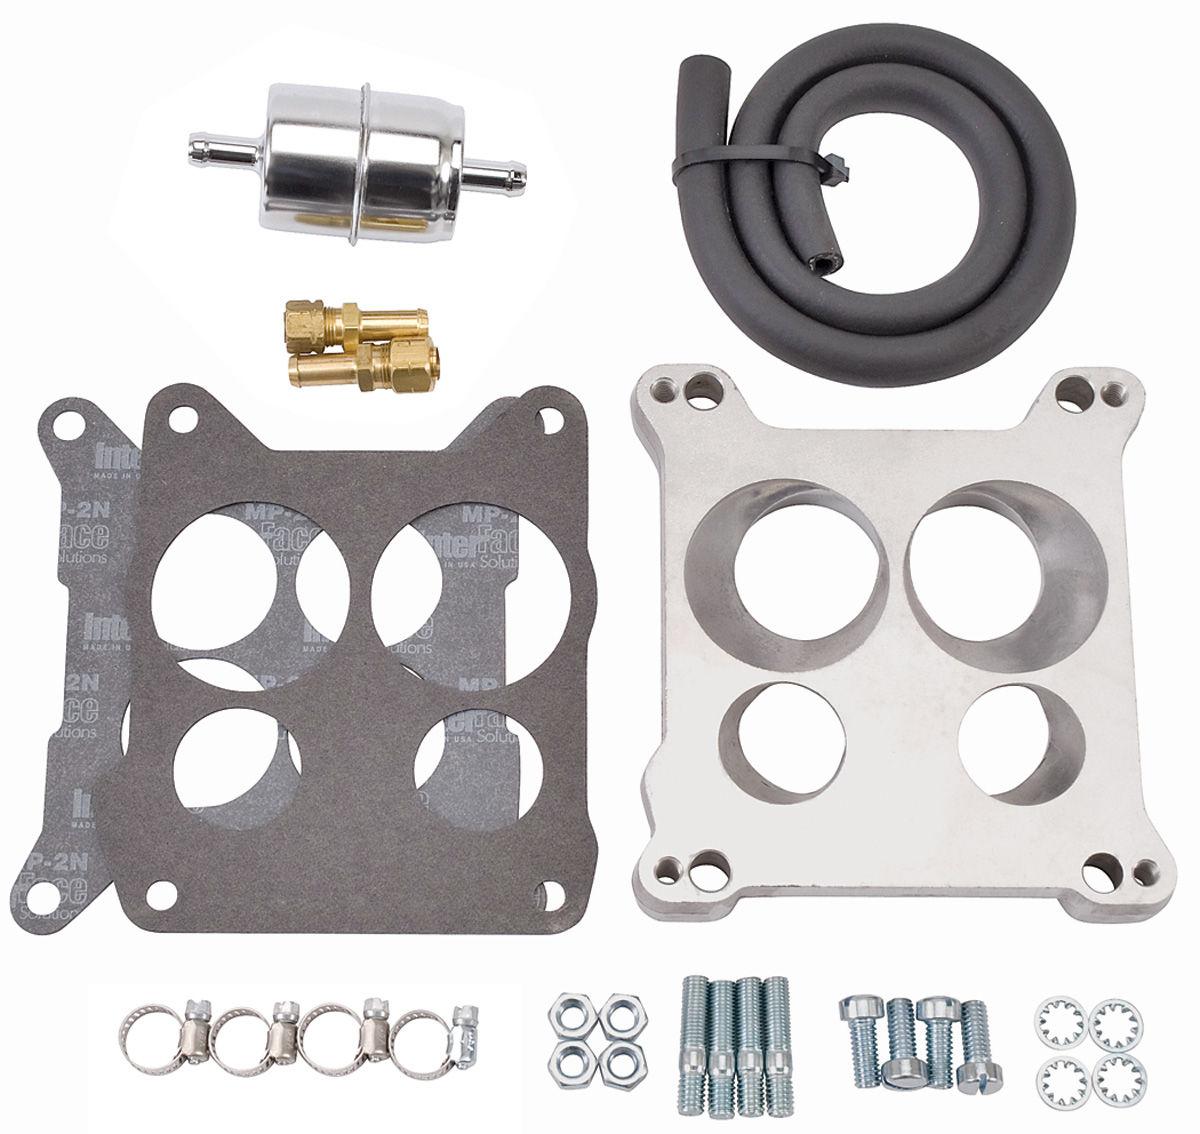 Photo of Quadrajet Adapter & Fuel Line Kit